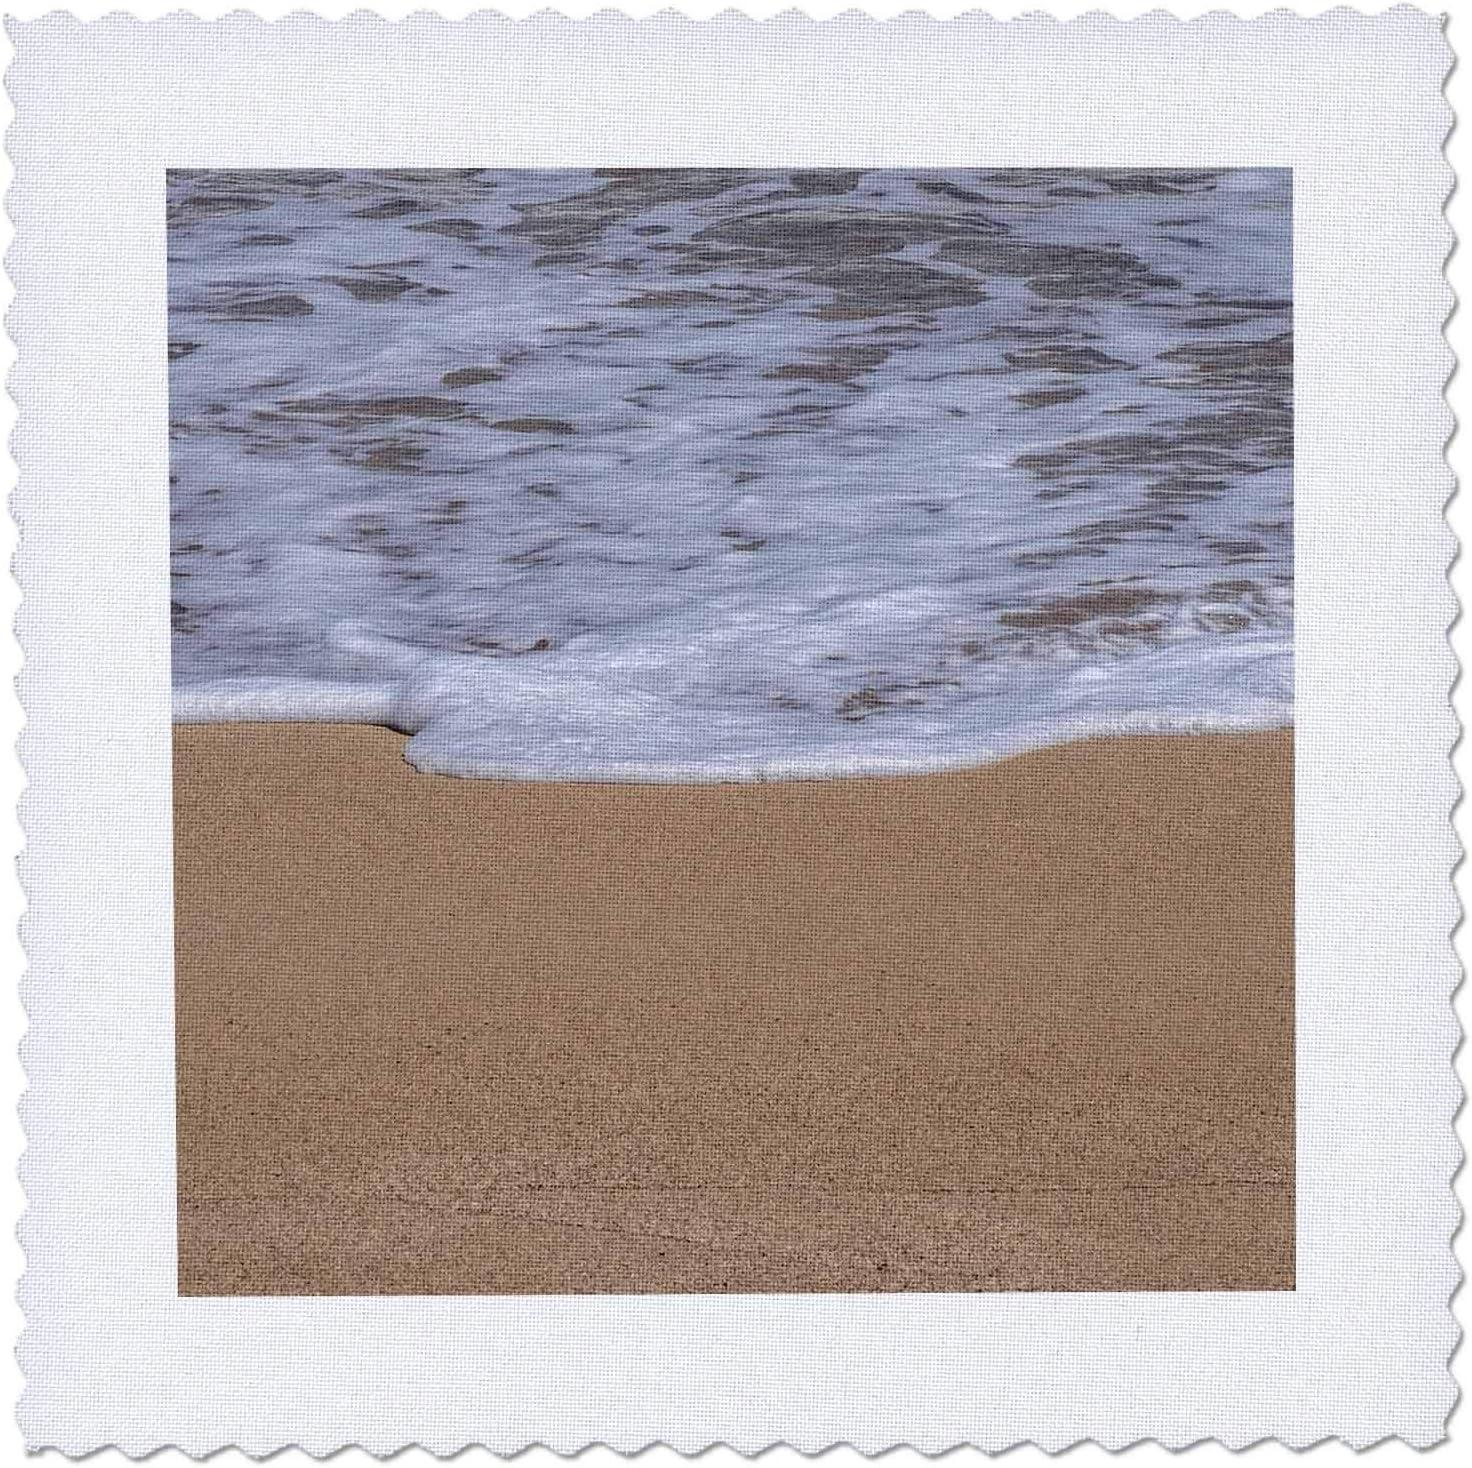 3dRose Danita Delimont - Surprise Excellent price Beaches Sea beac sandy foam on Golden